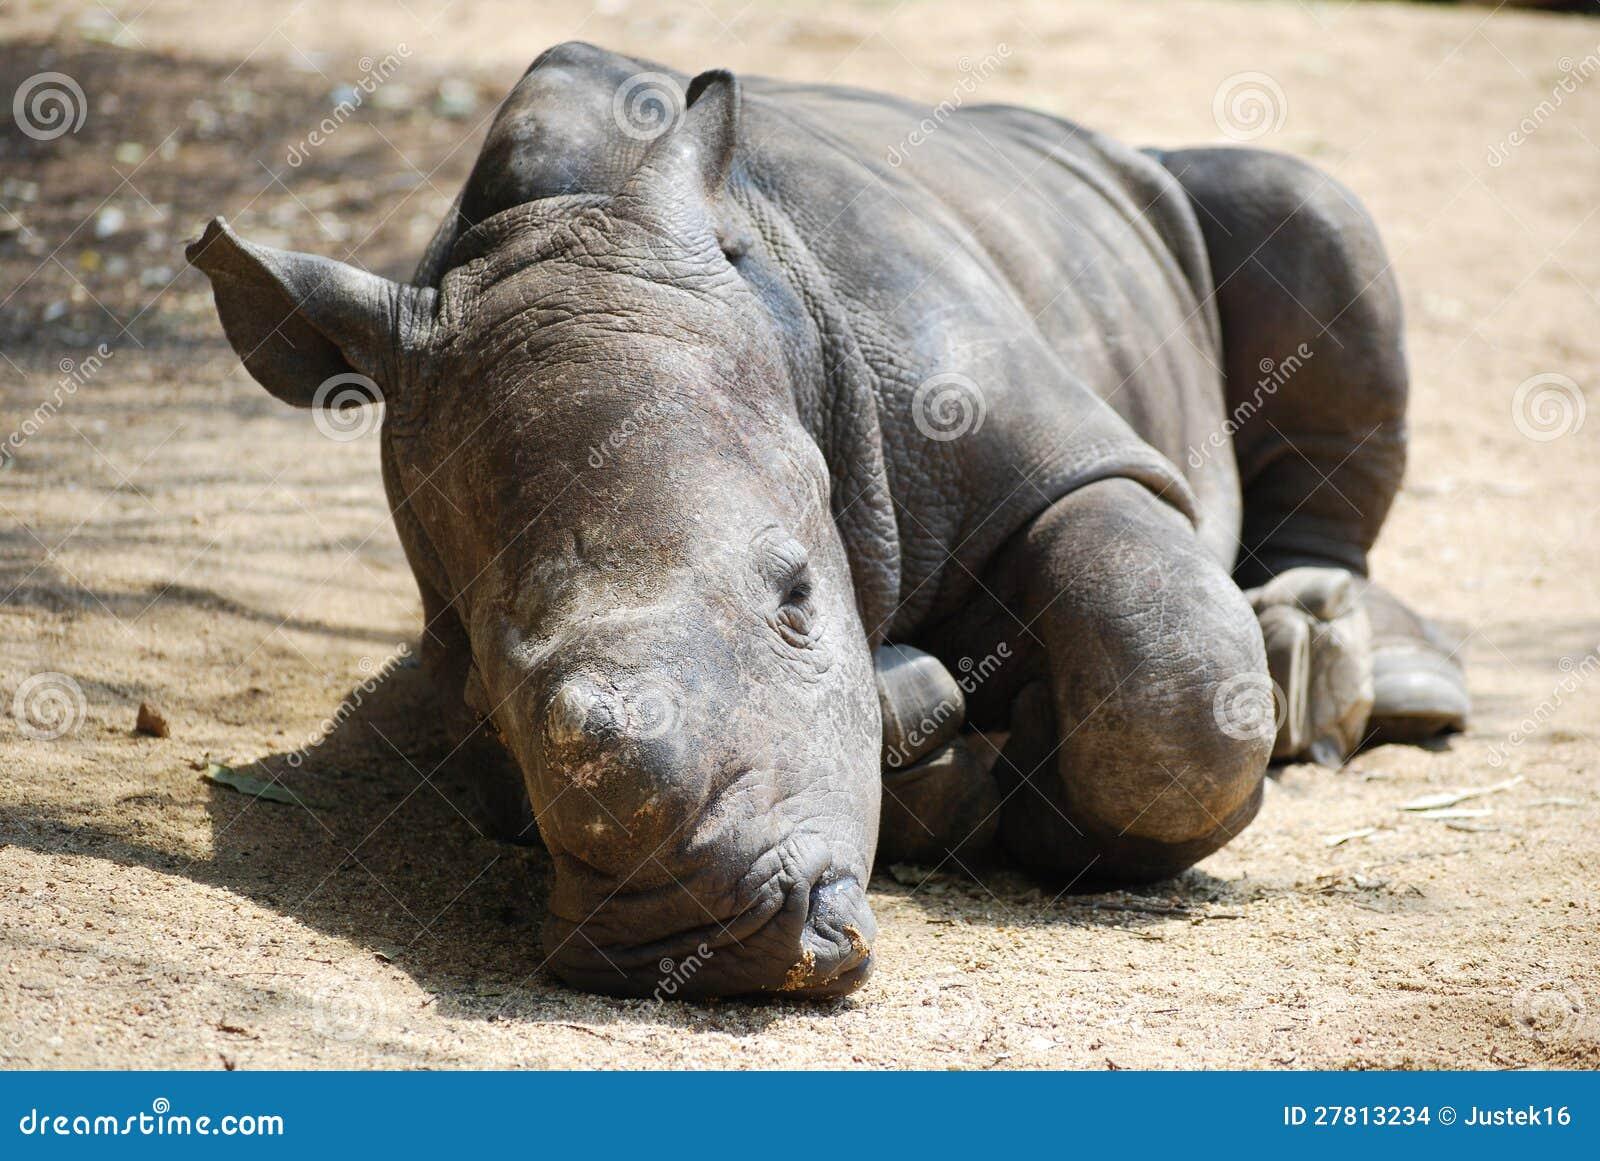 Rhino Sleeping Stock Photos, Royalty-Free Images & Vectors ...